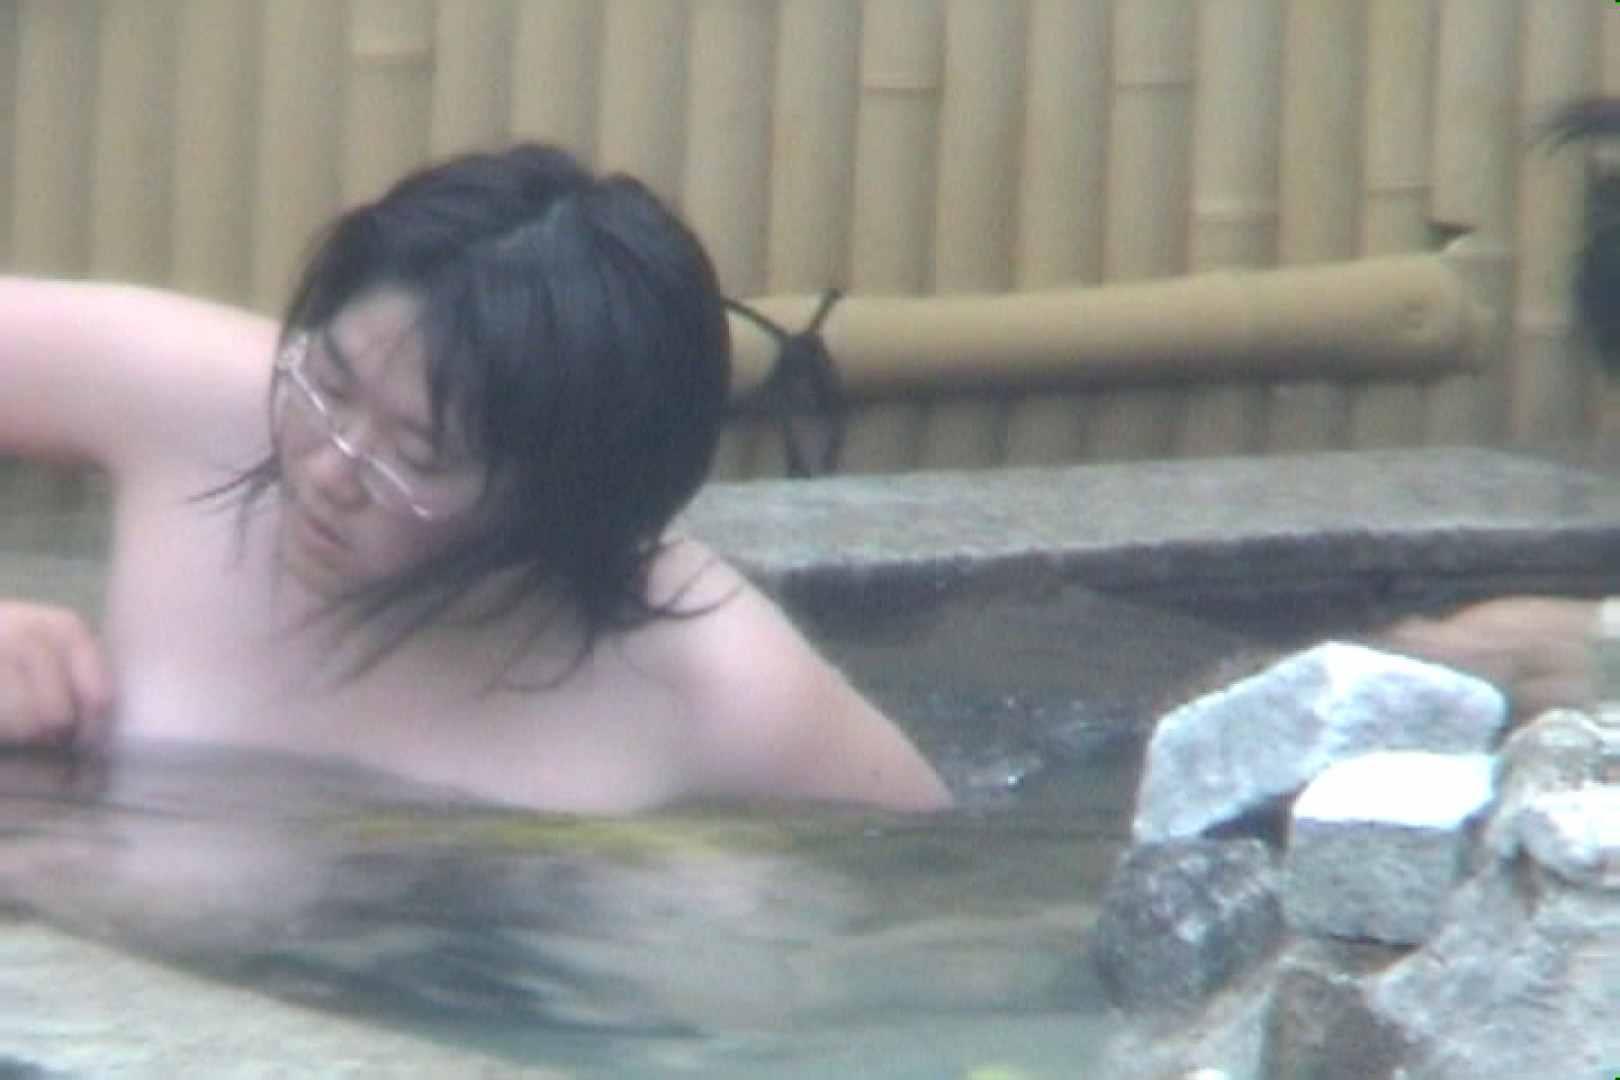 Aquaな露天風呂Vol.46【VIP限定】 0  54連発 4